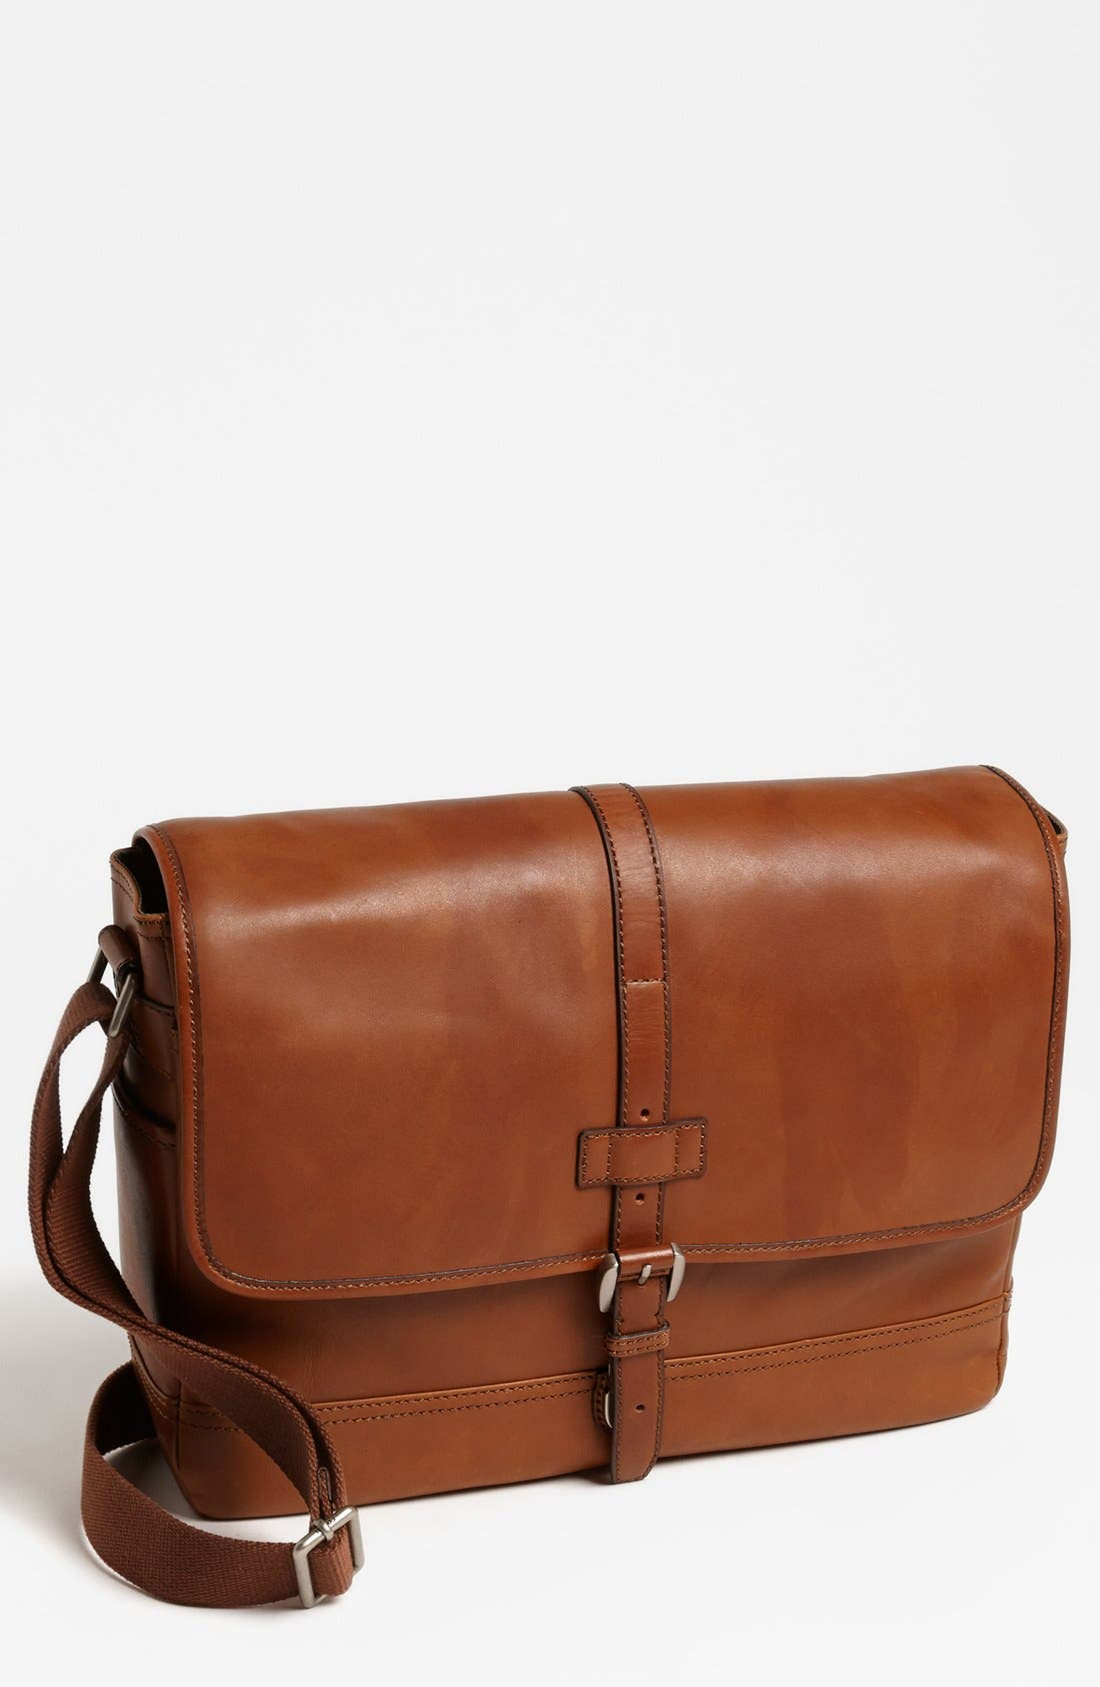 Alternate Image 1 Selected - Fossil 'Emerson' Messenger Bag